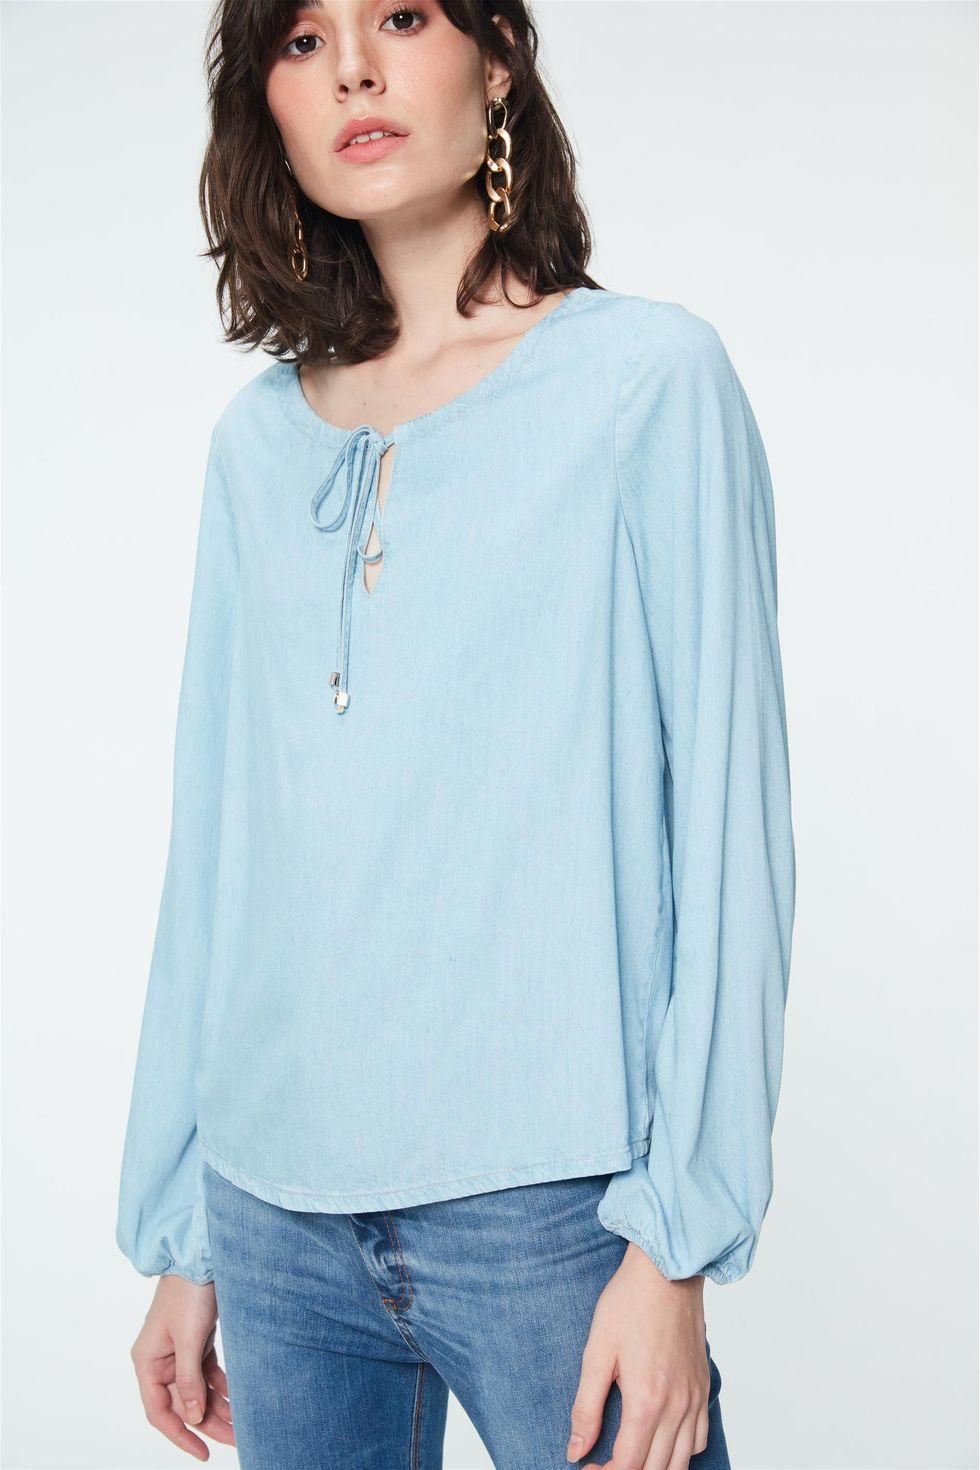 Blusa-Jeans-Azul-Claro-Feminina-Frente--